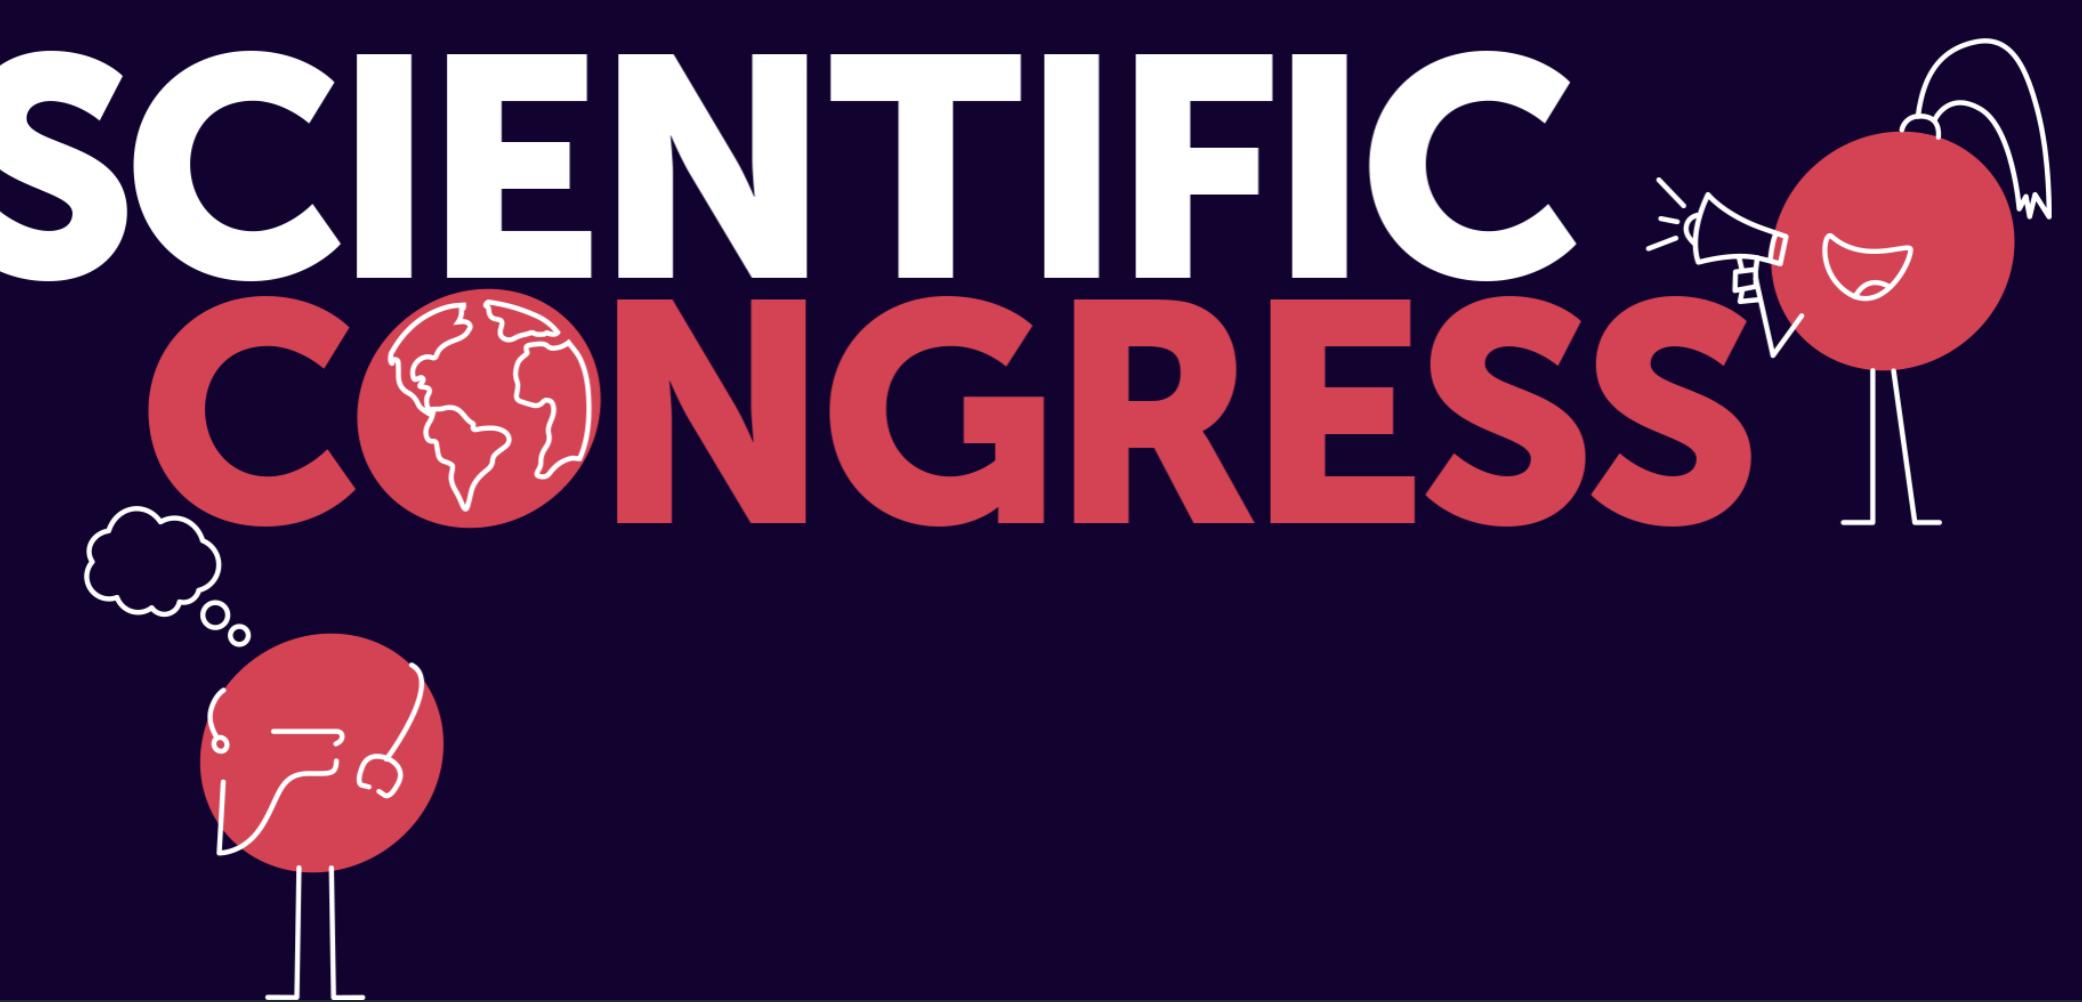 emotive achieves international reach at scientific congresses